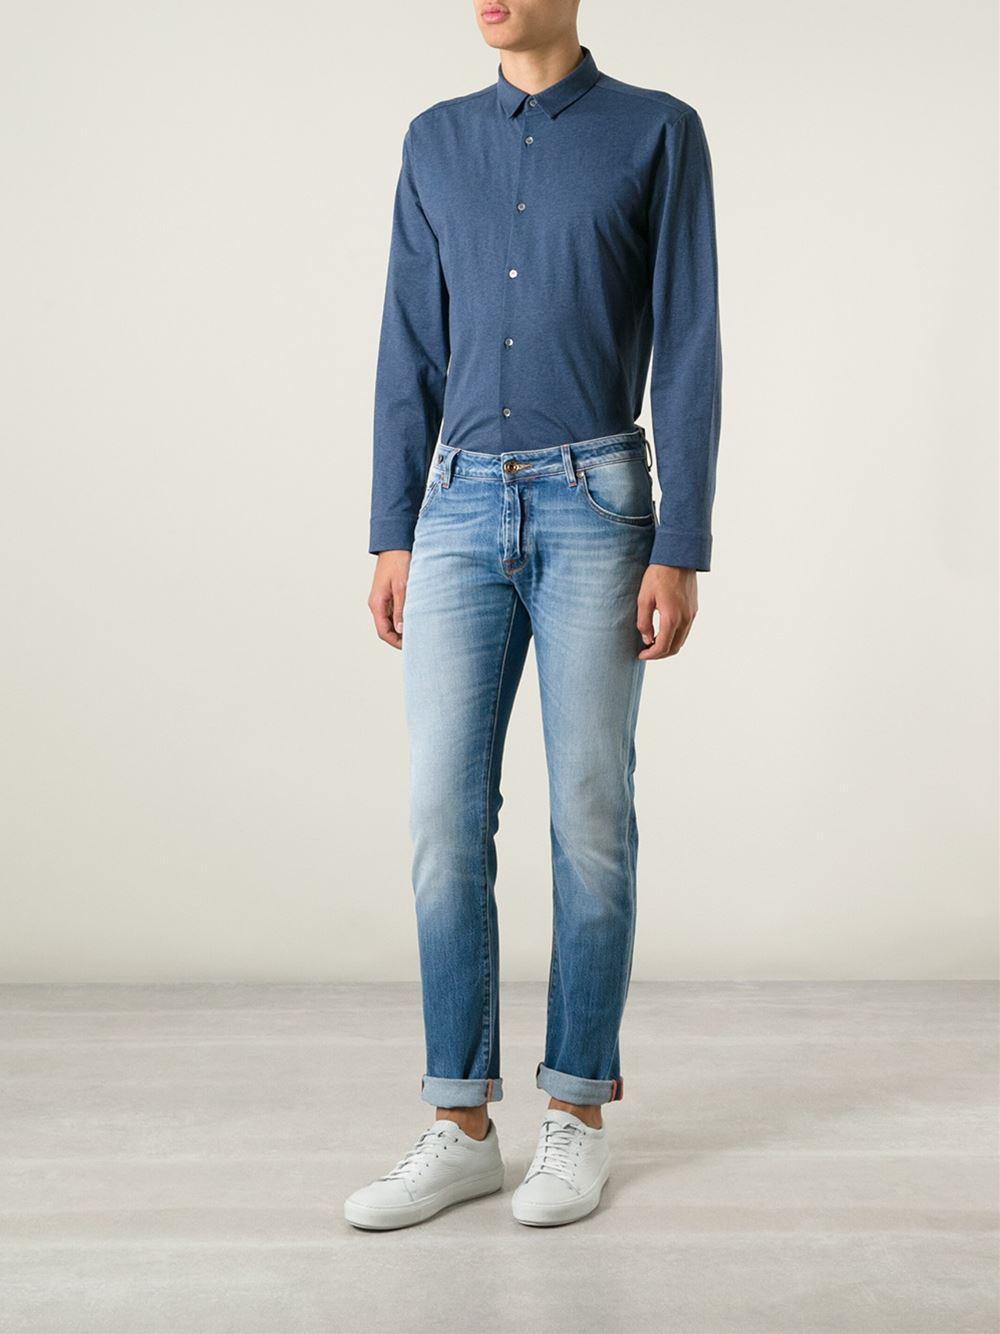 Jacob cohen 39 nick 39 washed jeans in blue for men lyst - Jacob cohen denim ...